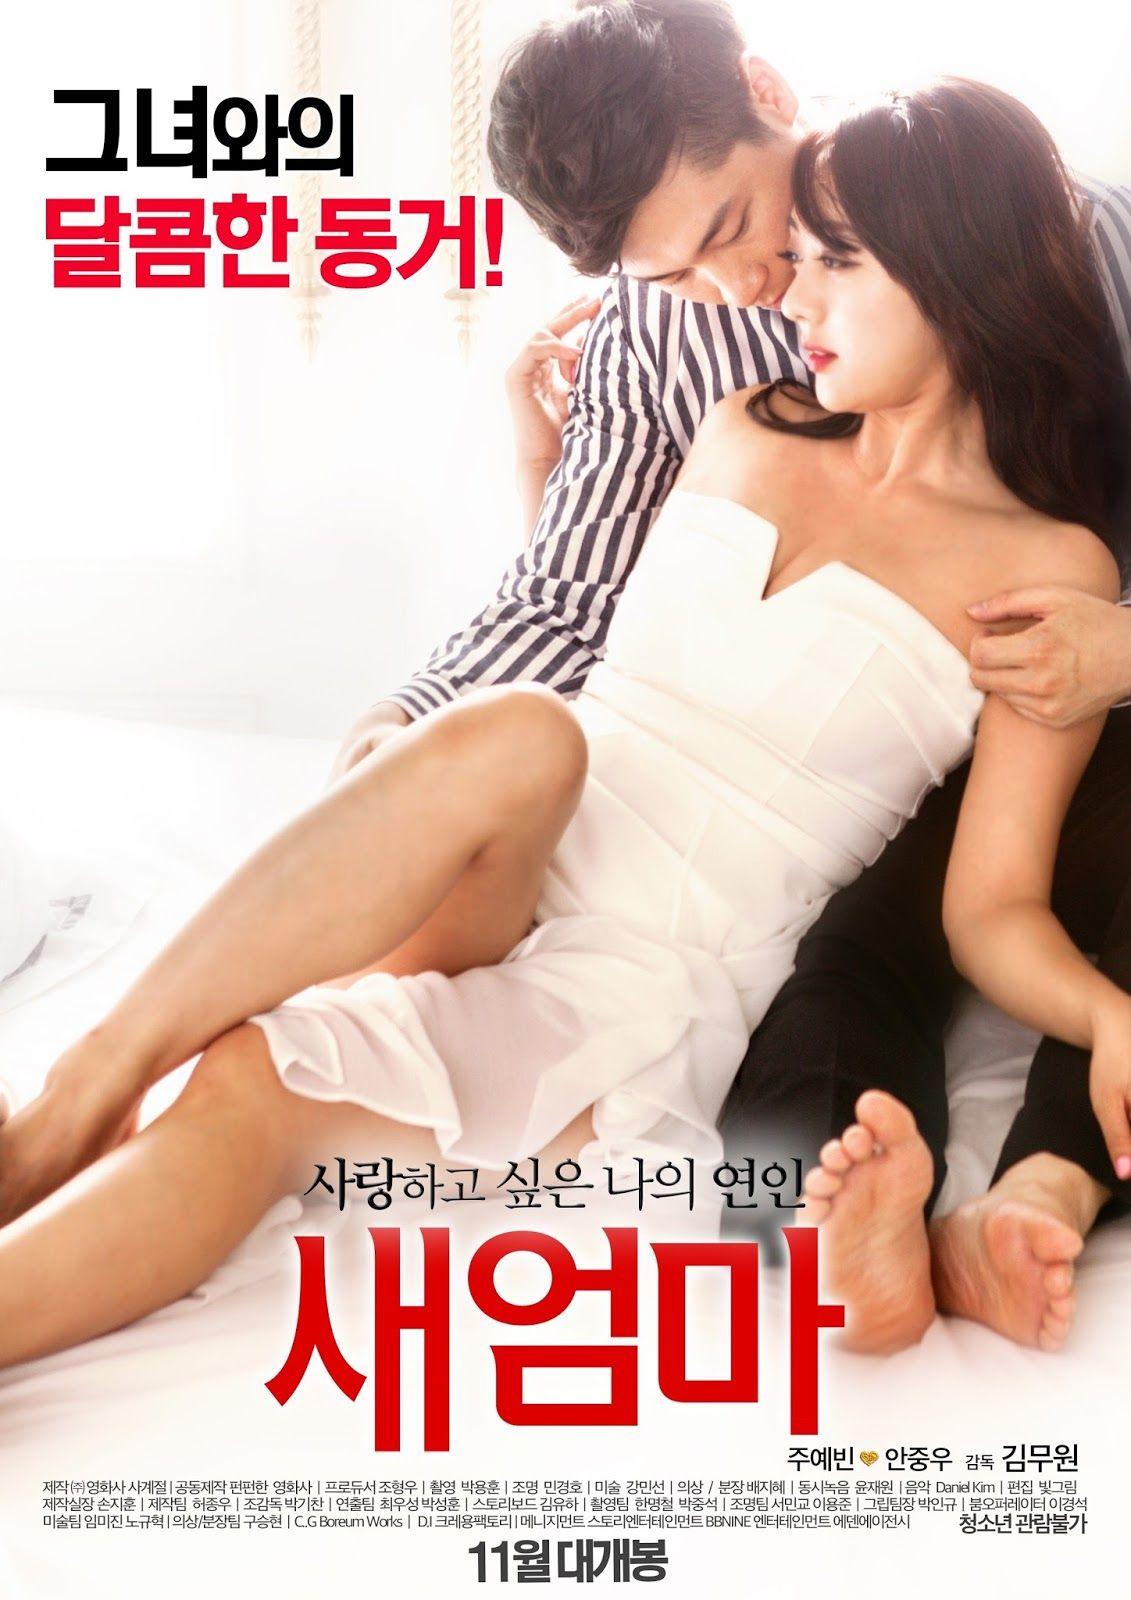 xx hot film